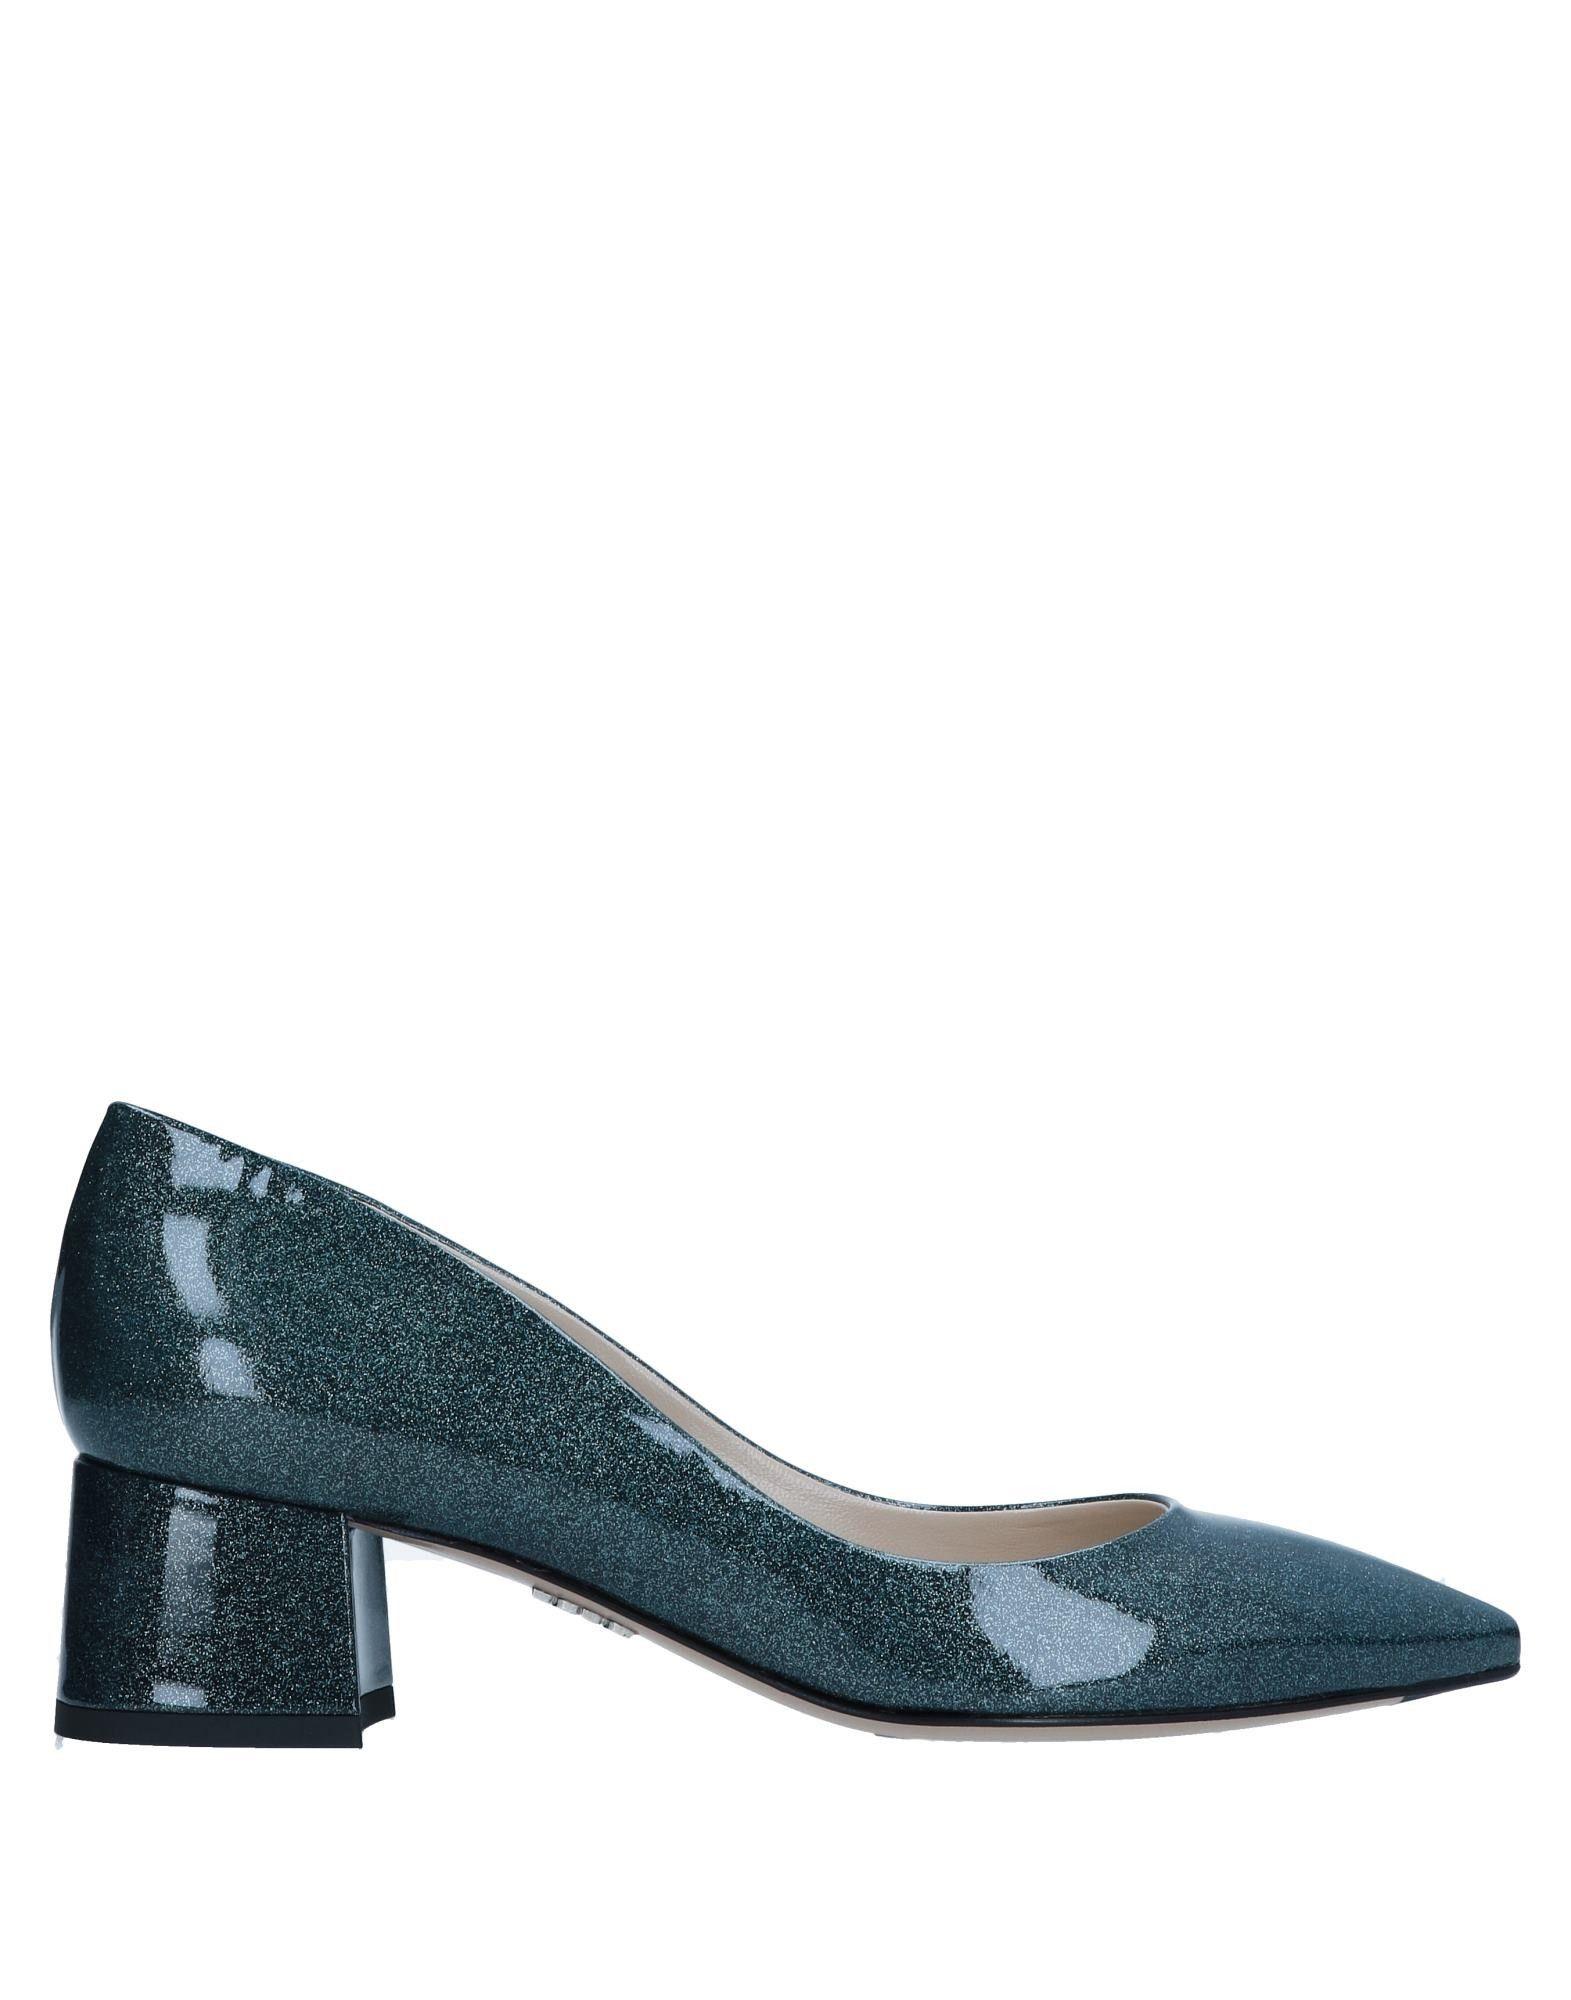 Rabatt Schuhe 11542212LU Rodo Pumps Damen  11542212LU Schuhe 494ff7